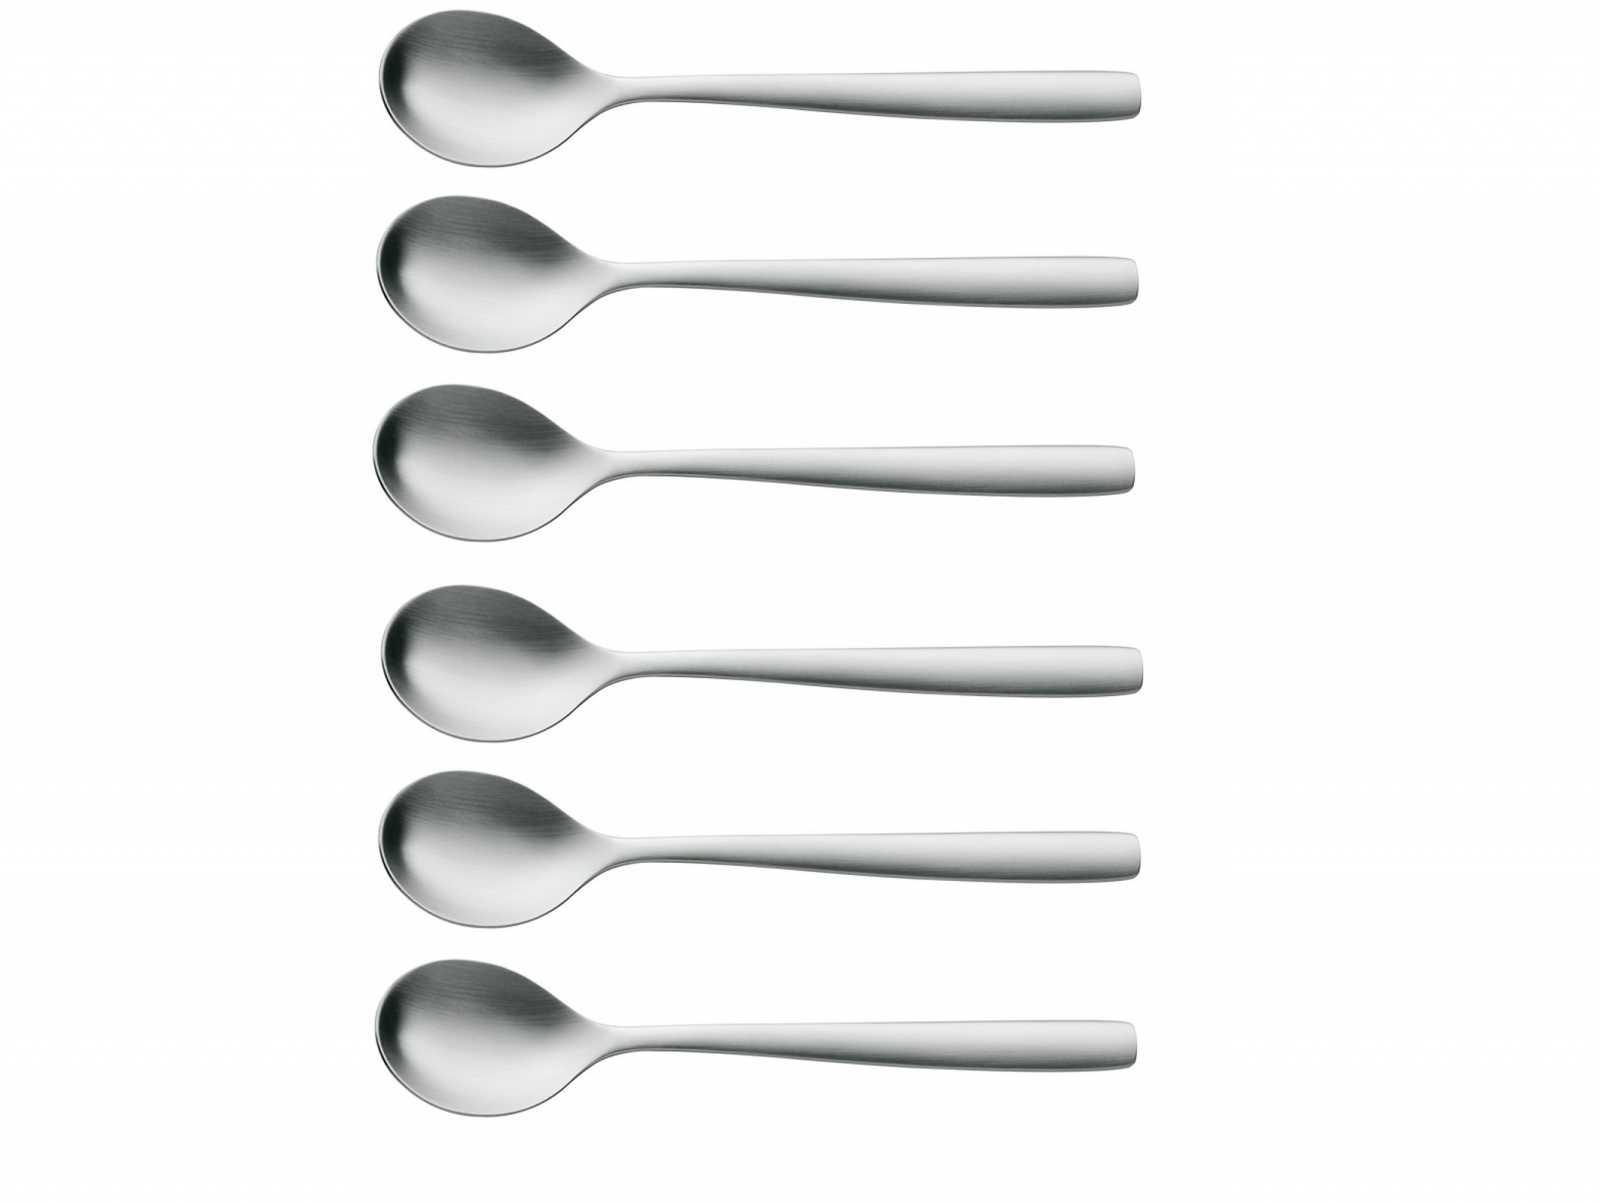 Онлайн каталог PROMENU: Набор ложек для яиц WMF PREGO, серебристый, 6 штук WMF 12 8471 6030